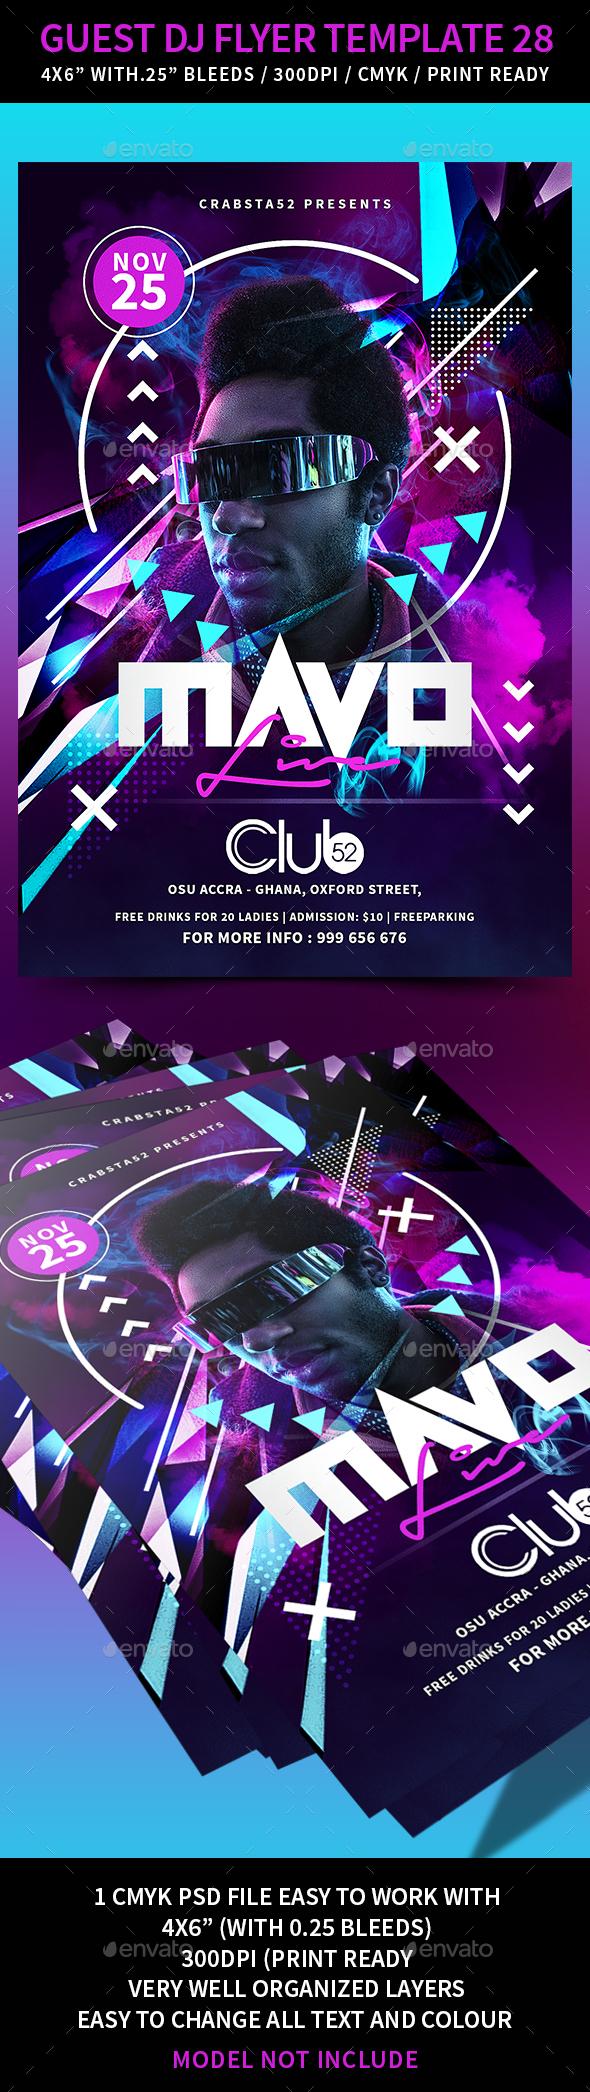 Guest DJ Flyer Template 28 - Clubs & Parties Events